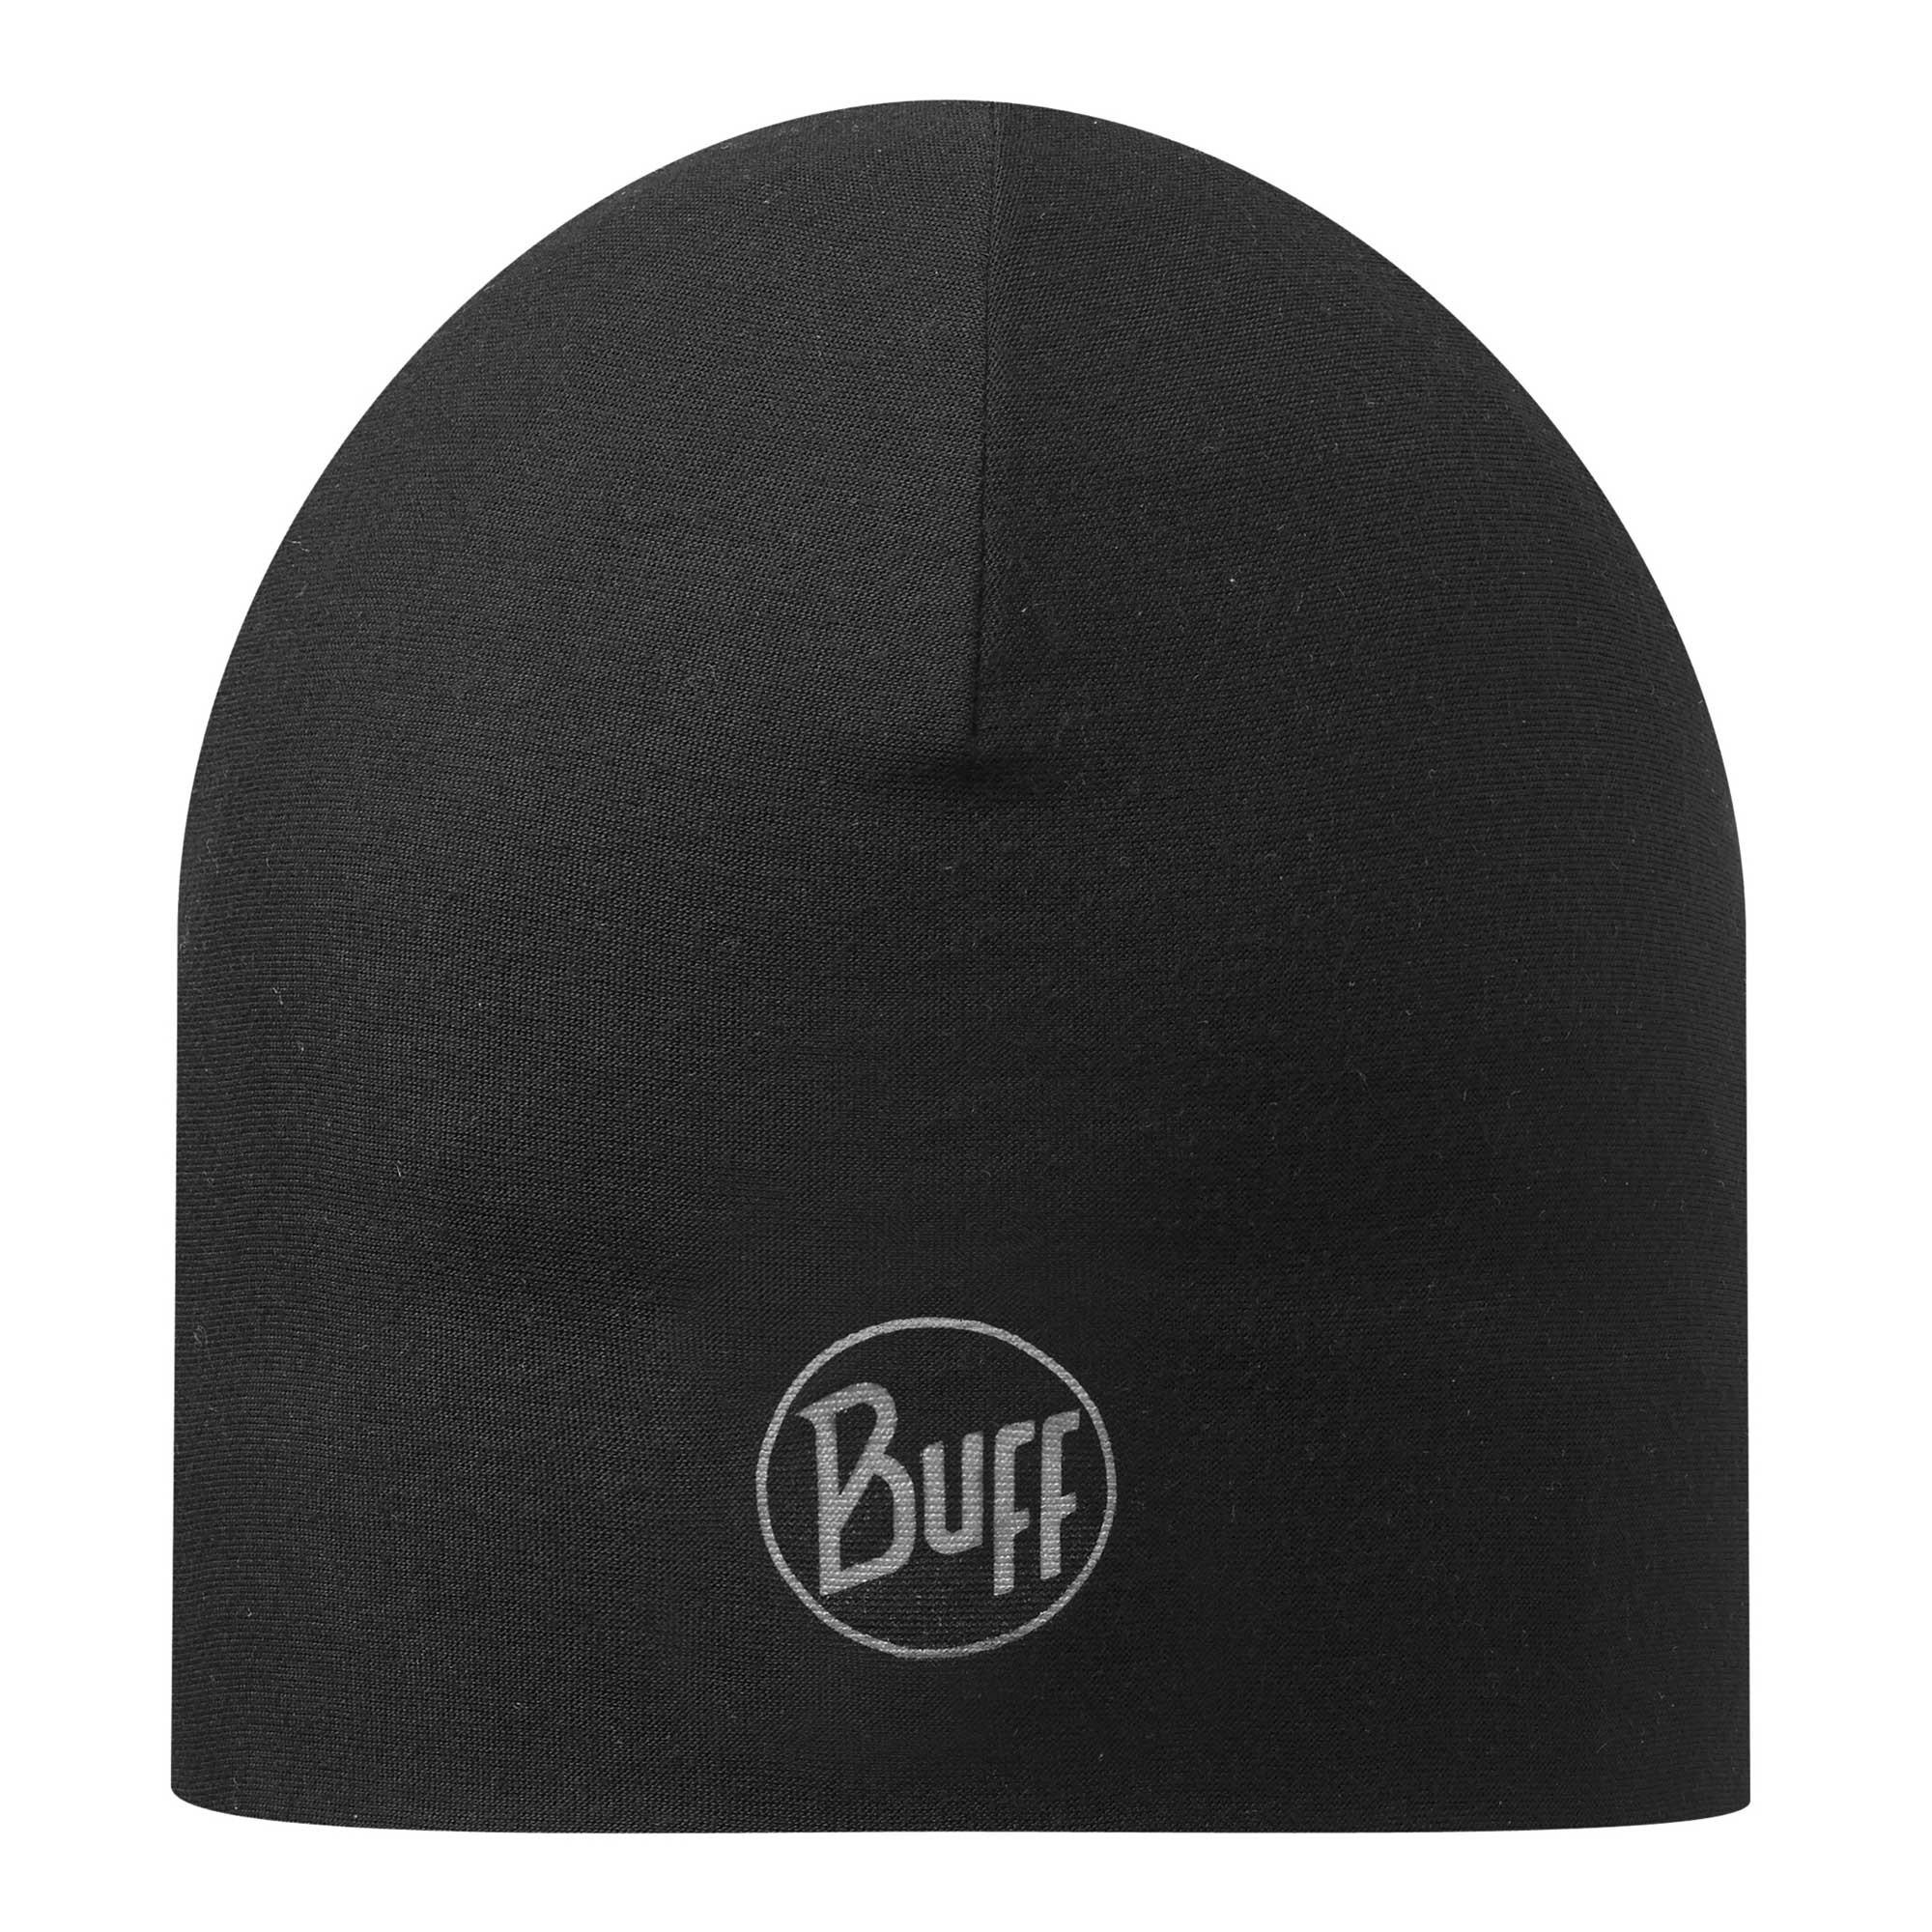 Buff Double Layer Microfibre Hat - Black